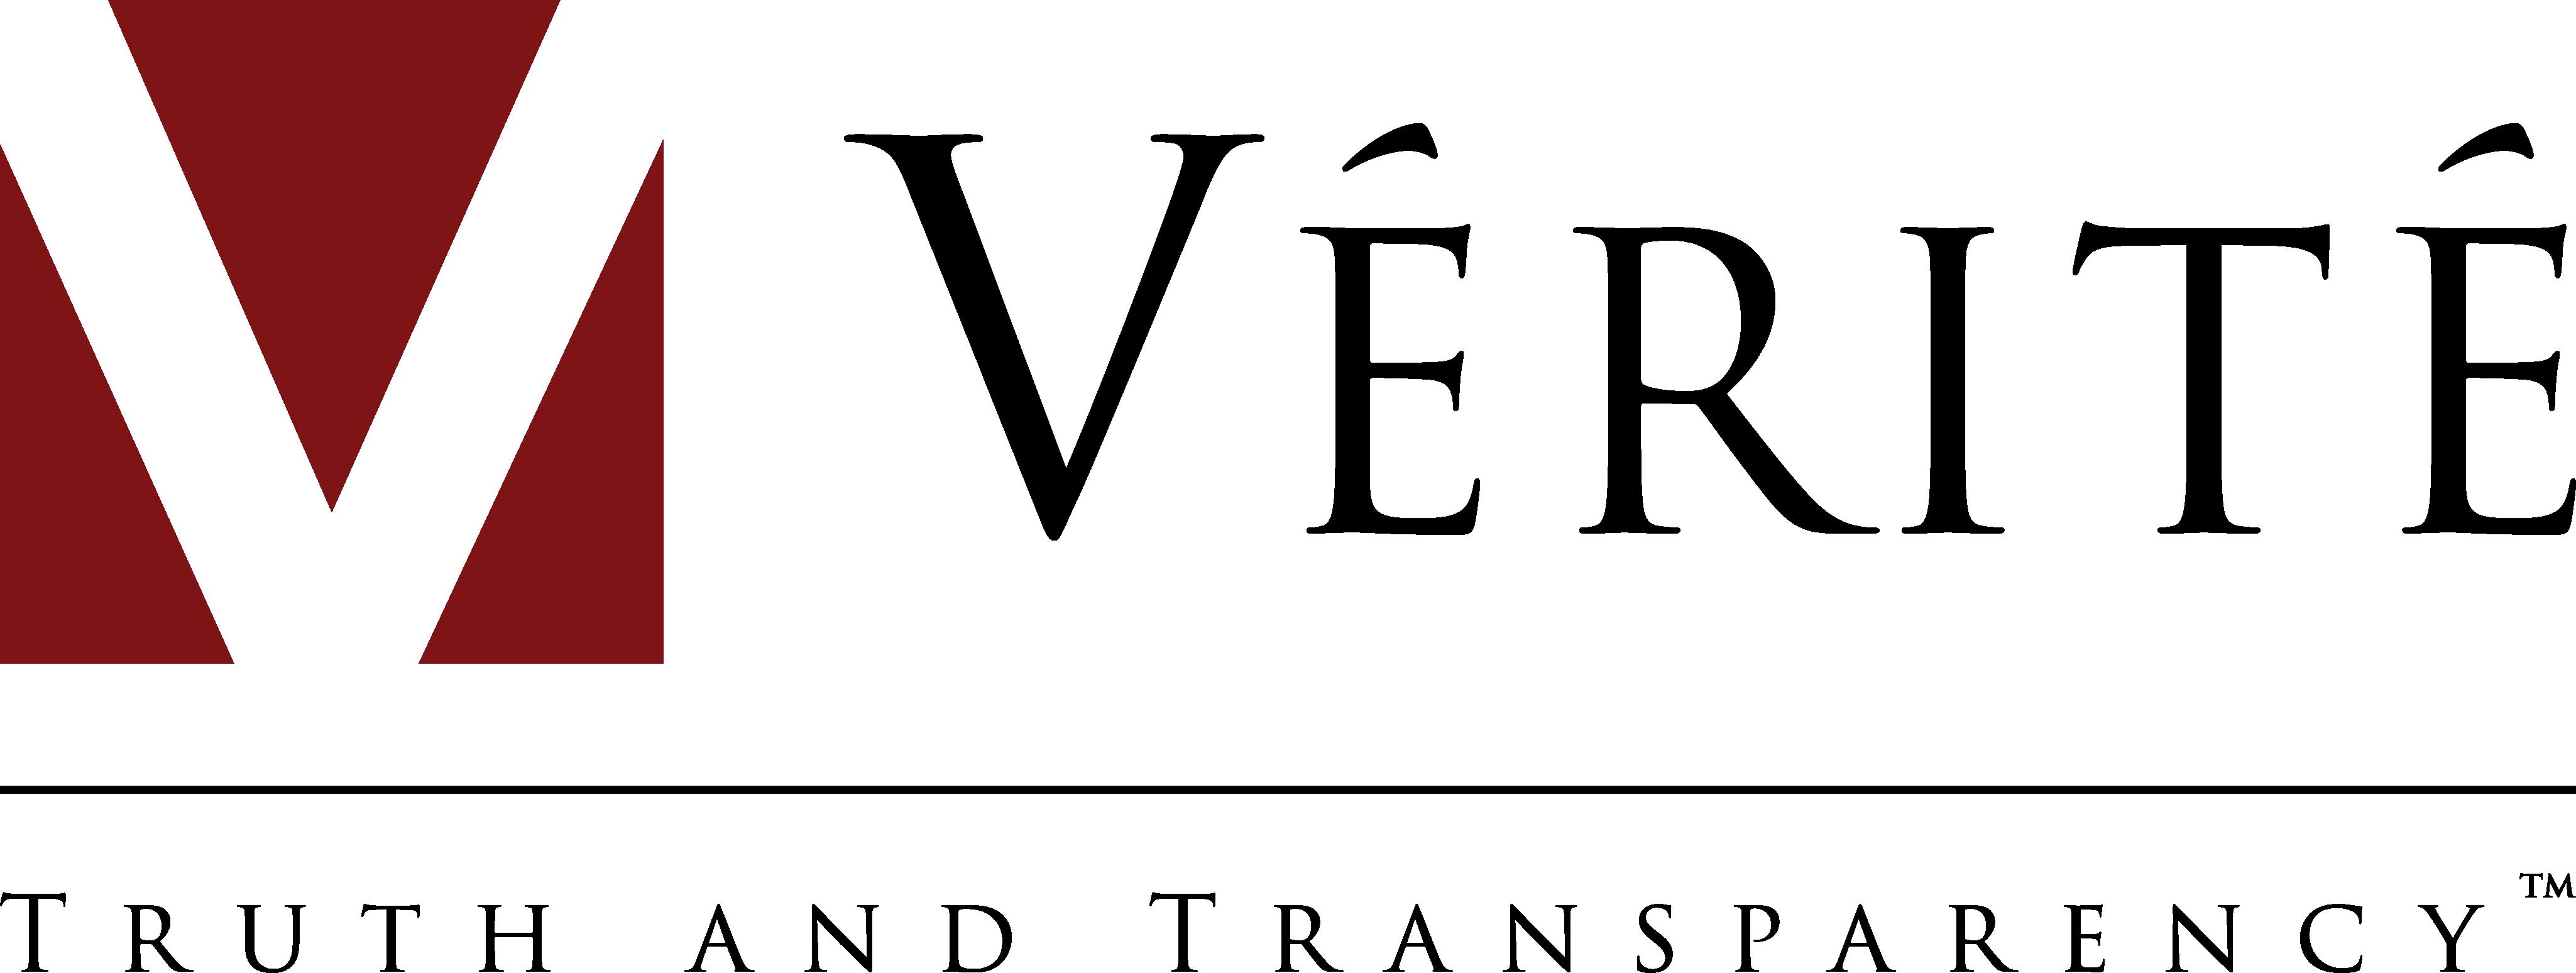 Veritegroupllc Logo